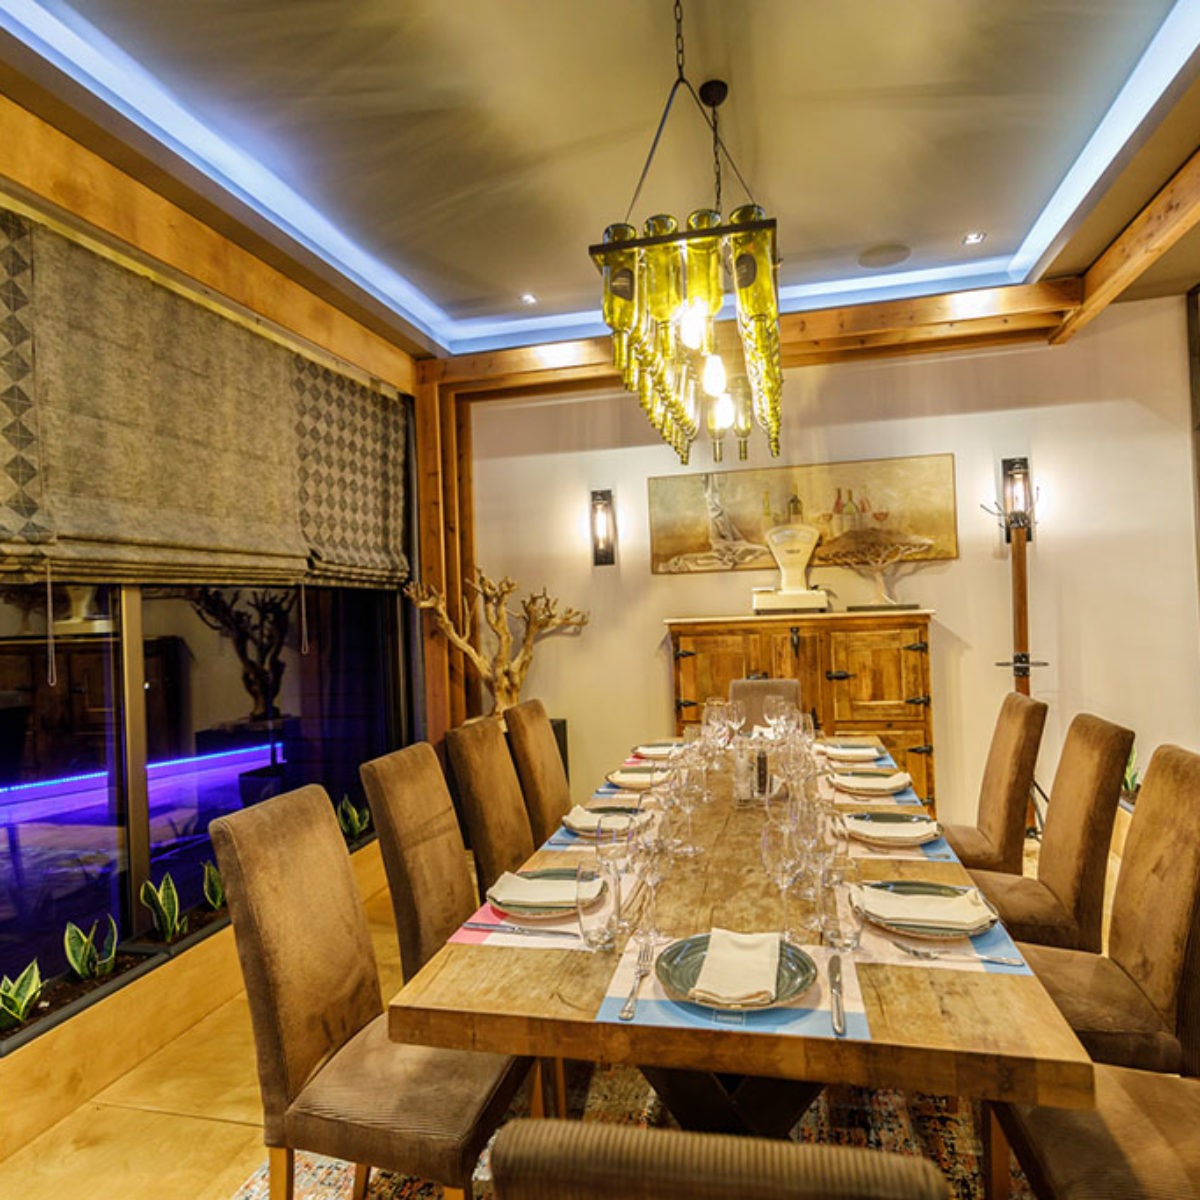 Yiamas Gastro Bar - Καλαμάτα - Restaurant - Χώρος 2